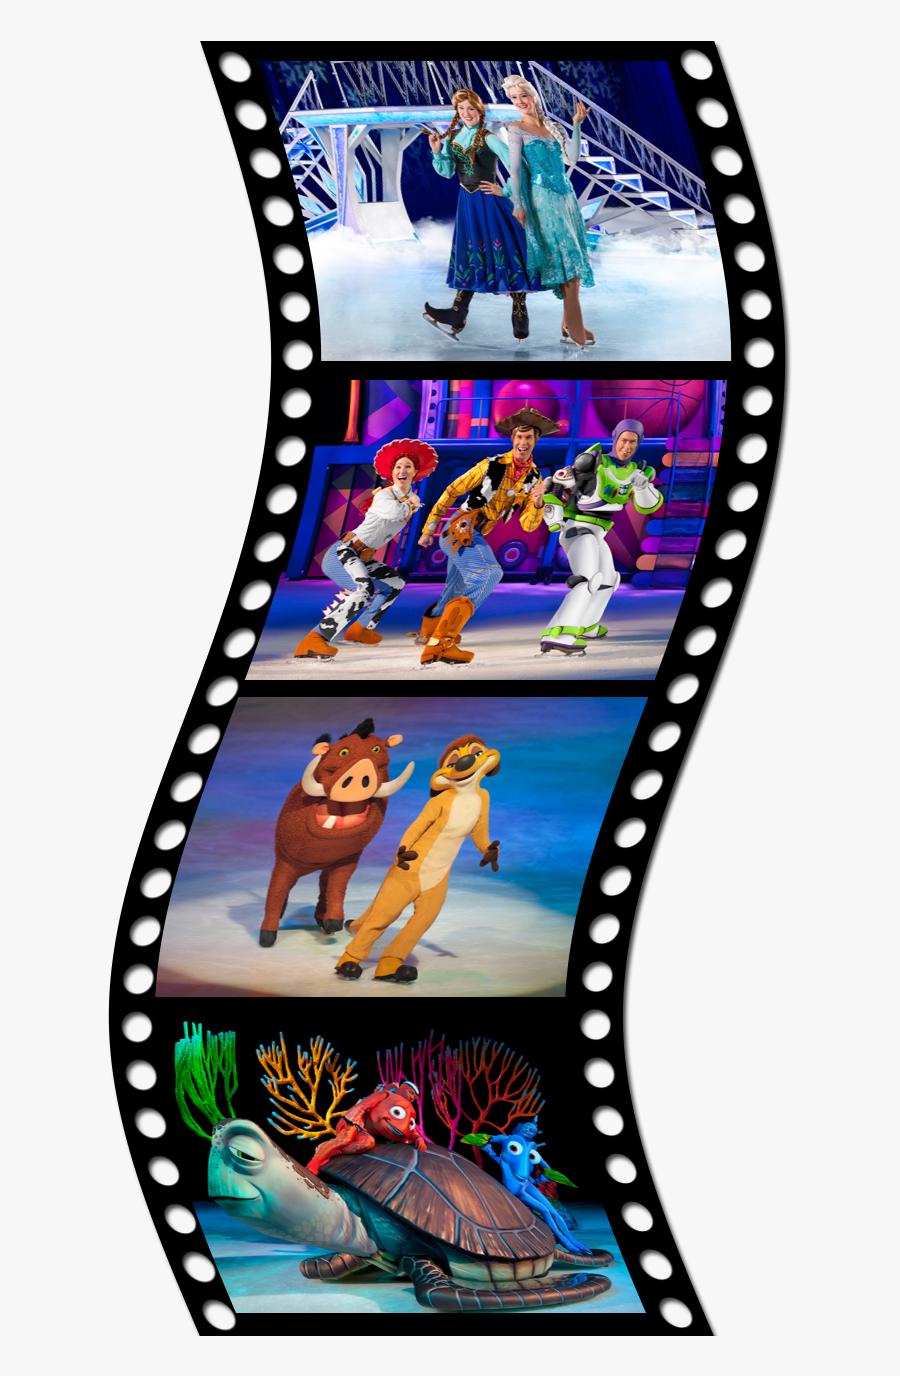 Transparent Roll Clipart - Color Movie Reel Png, Transparent Clipart